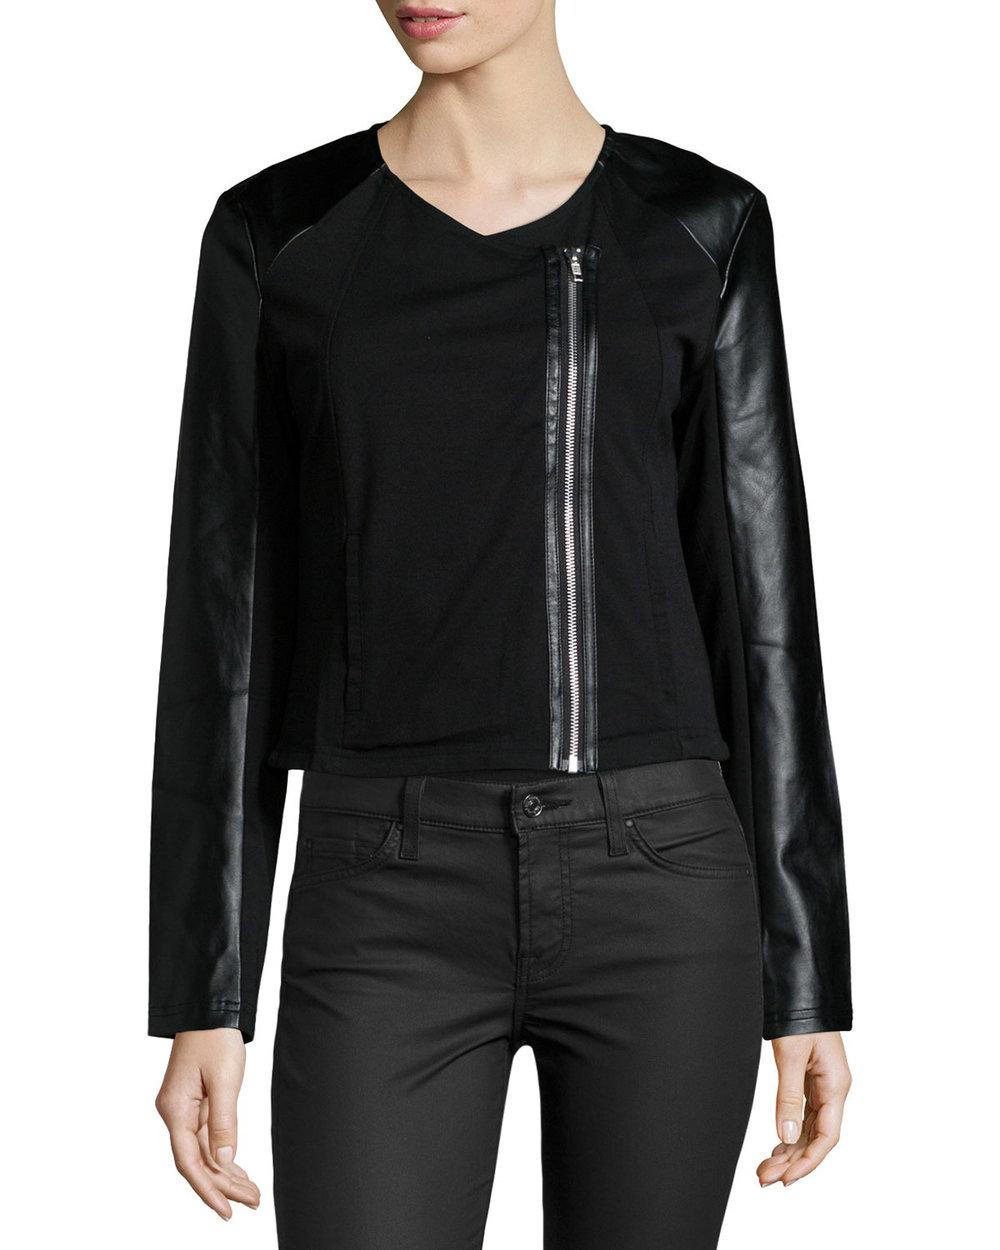 LA Made Lucia Mixed-Media Zip Jacket, Black. Neiman Marcus Last Call. Was: $85. Now: $27.